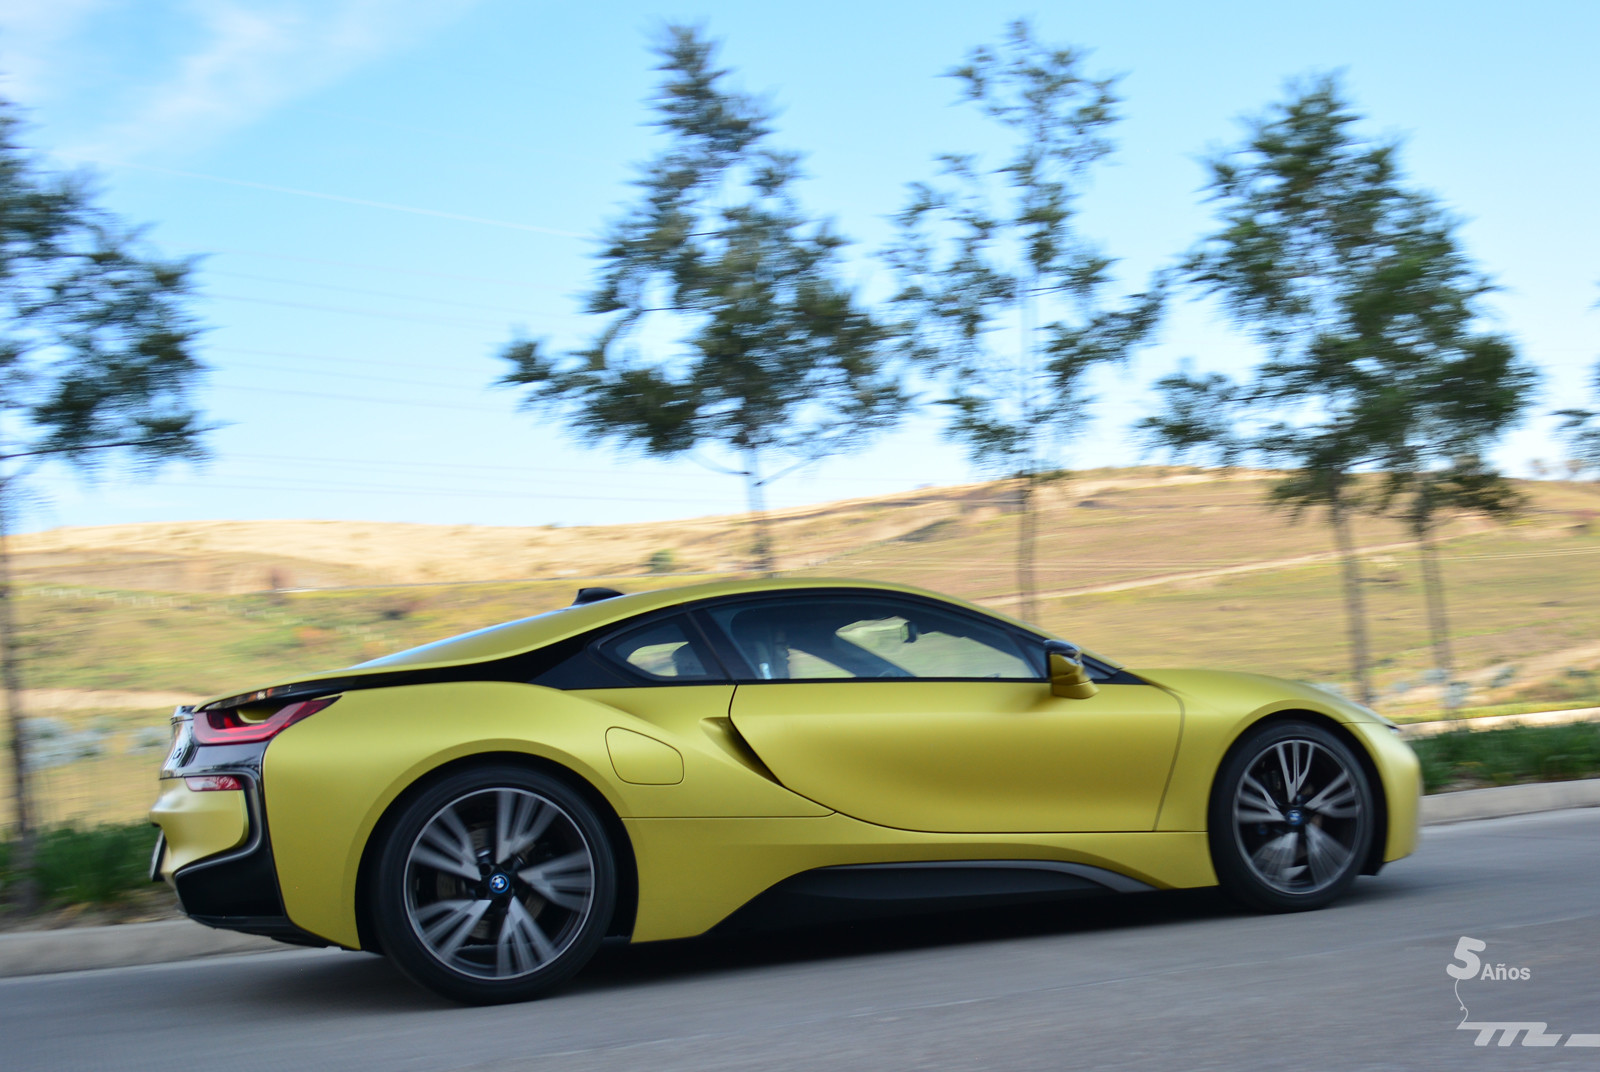 Foto de BMW i8 Protonic Frozen Yellow 2017 (7/21)